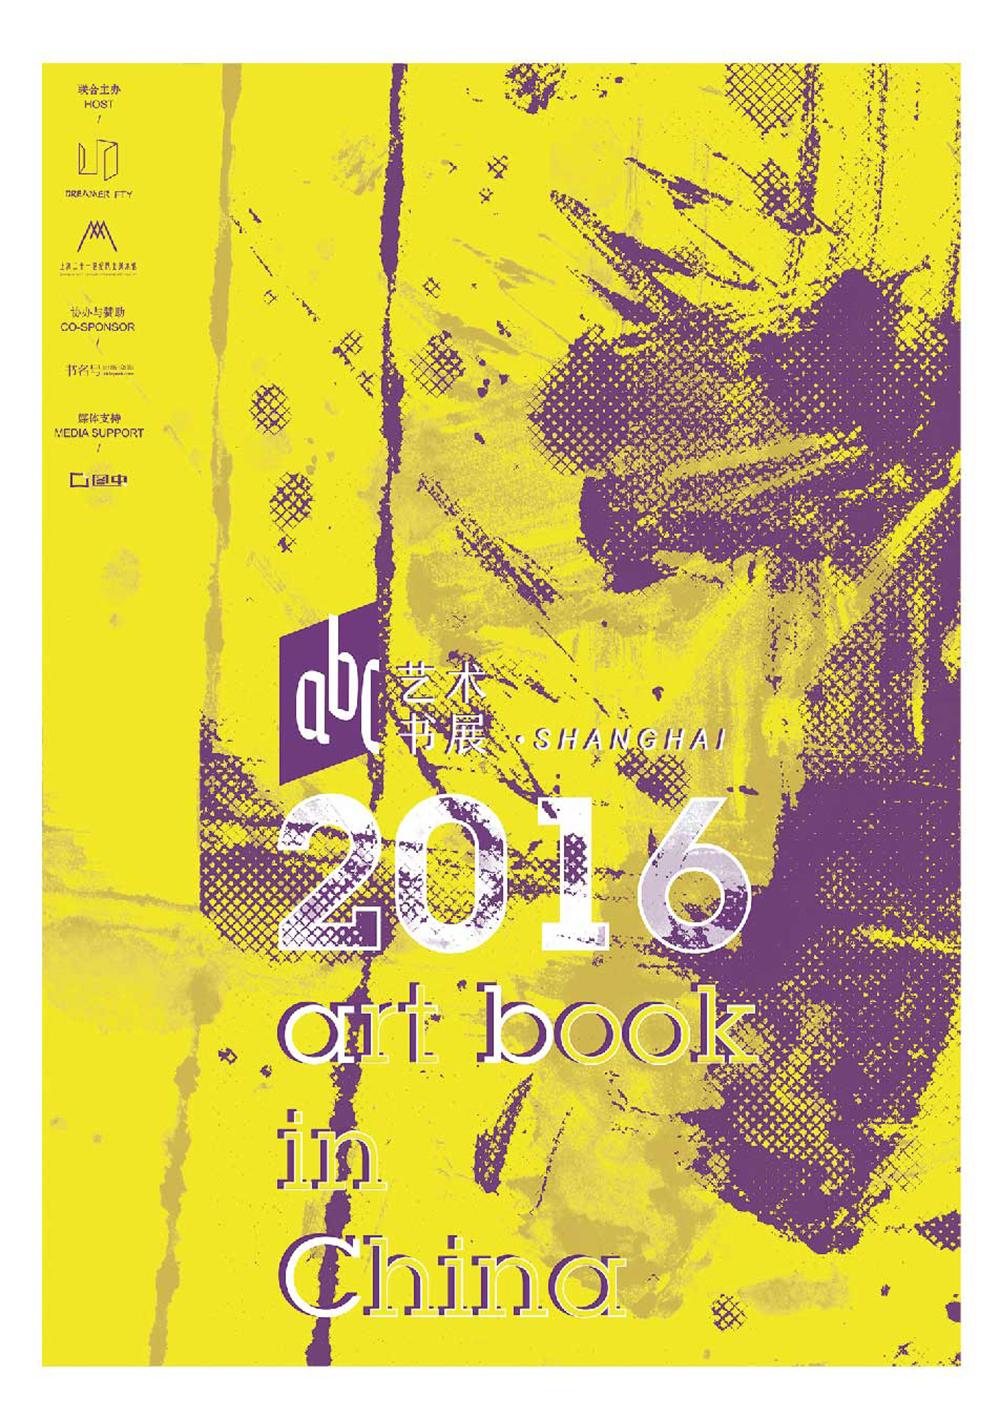 Art book in China-abC Art Book Fair - 21st Century Minsheng Art Museum | Shanghai China | Aug 19-Aug 21, 2016Host: Dreamer FTY